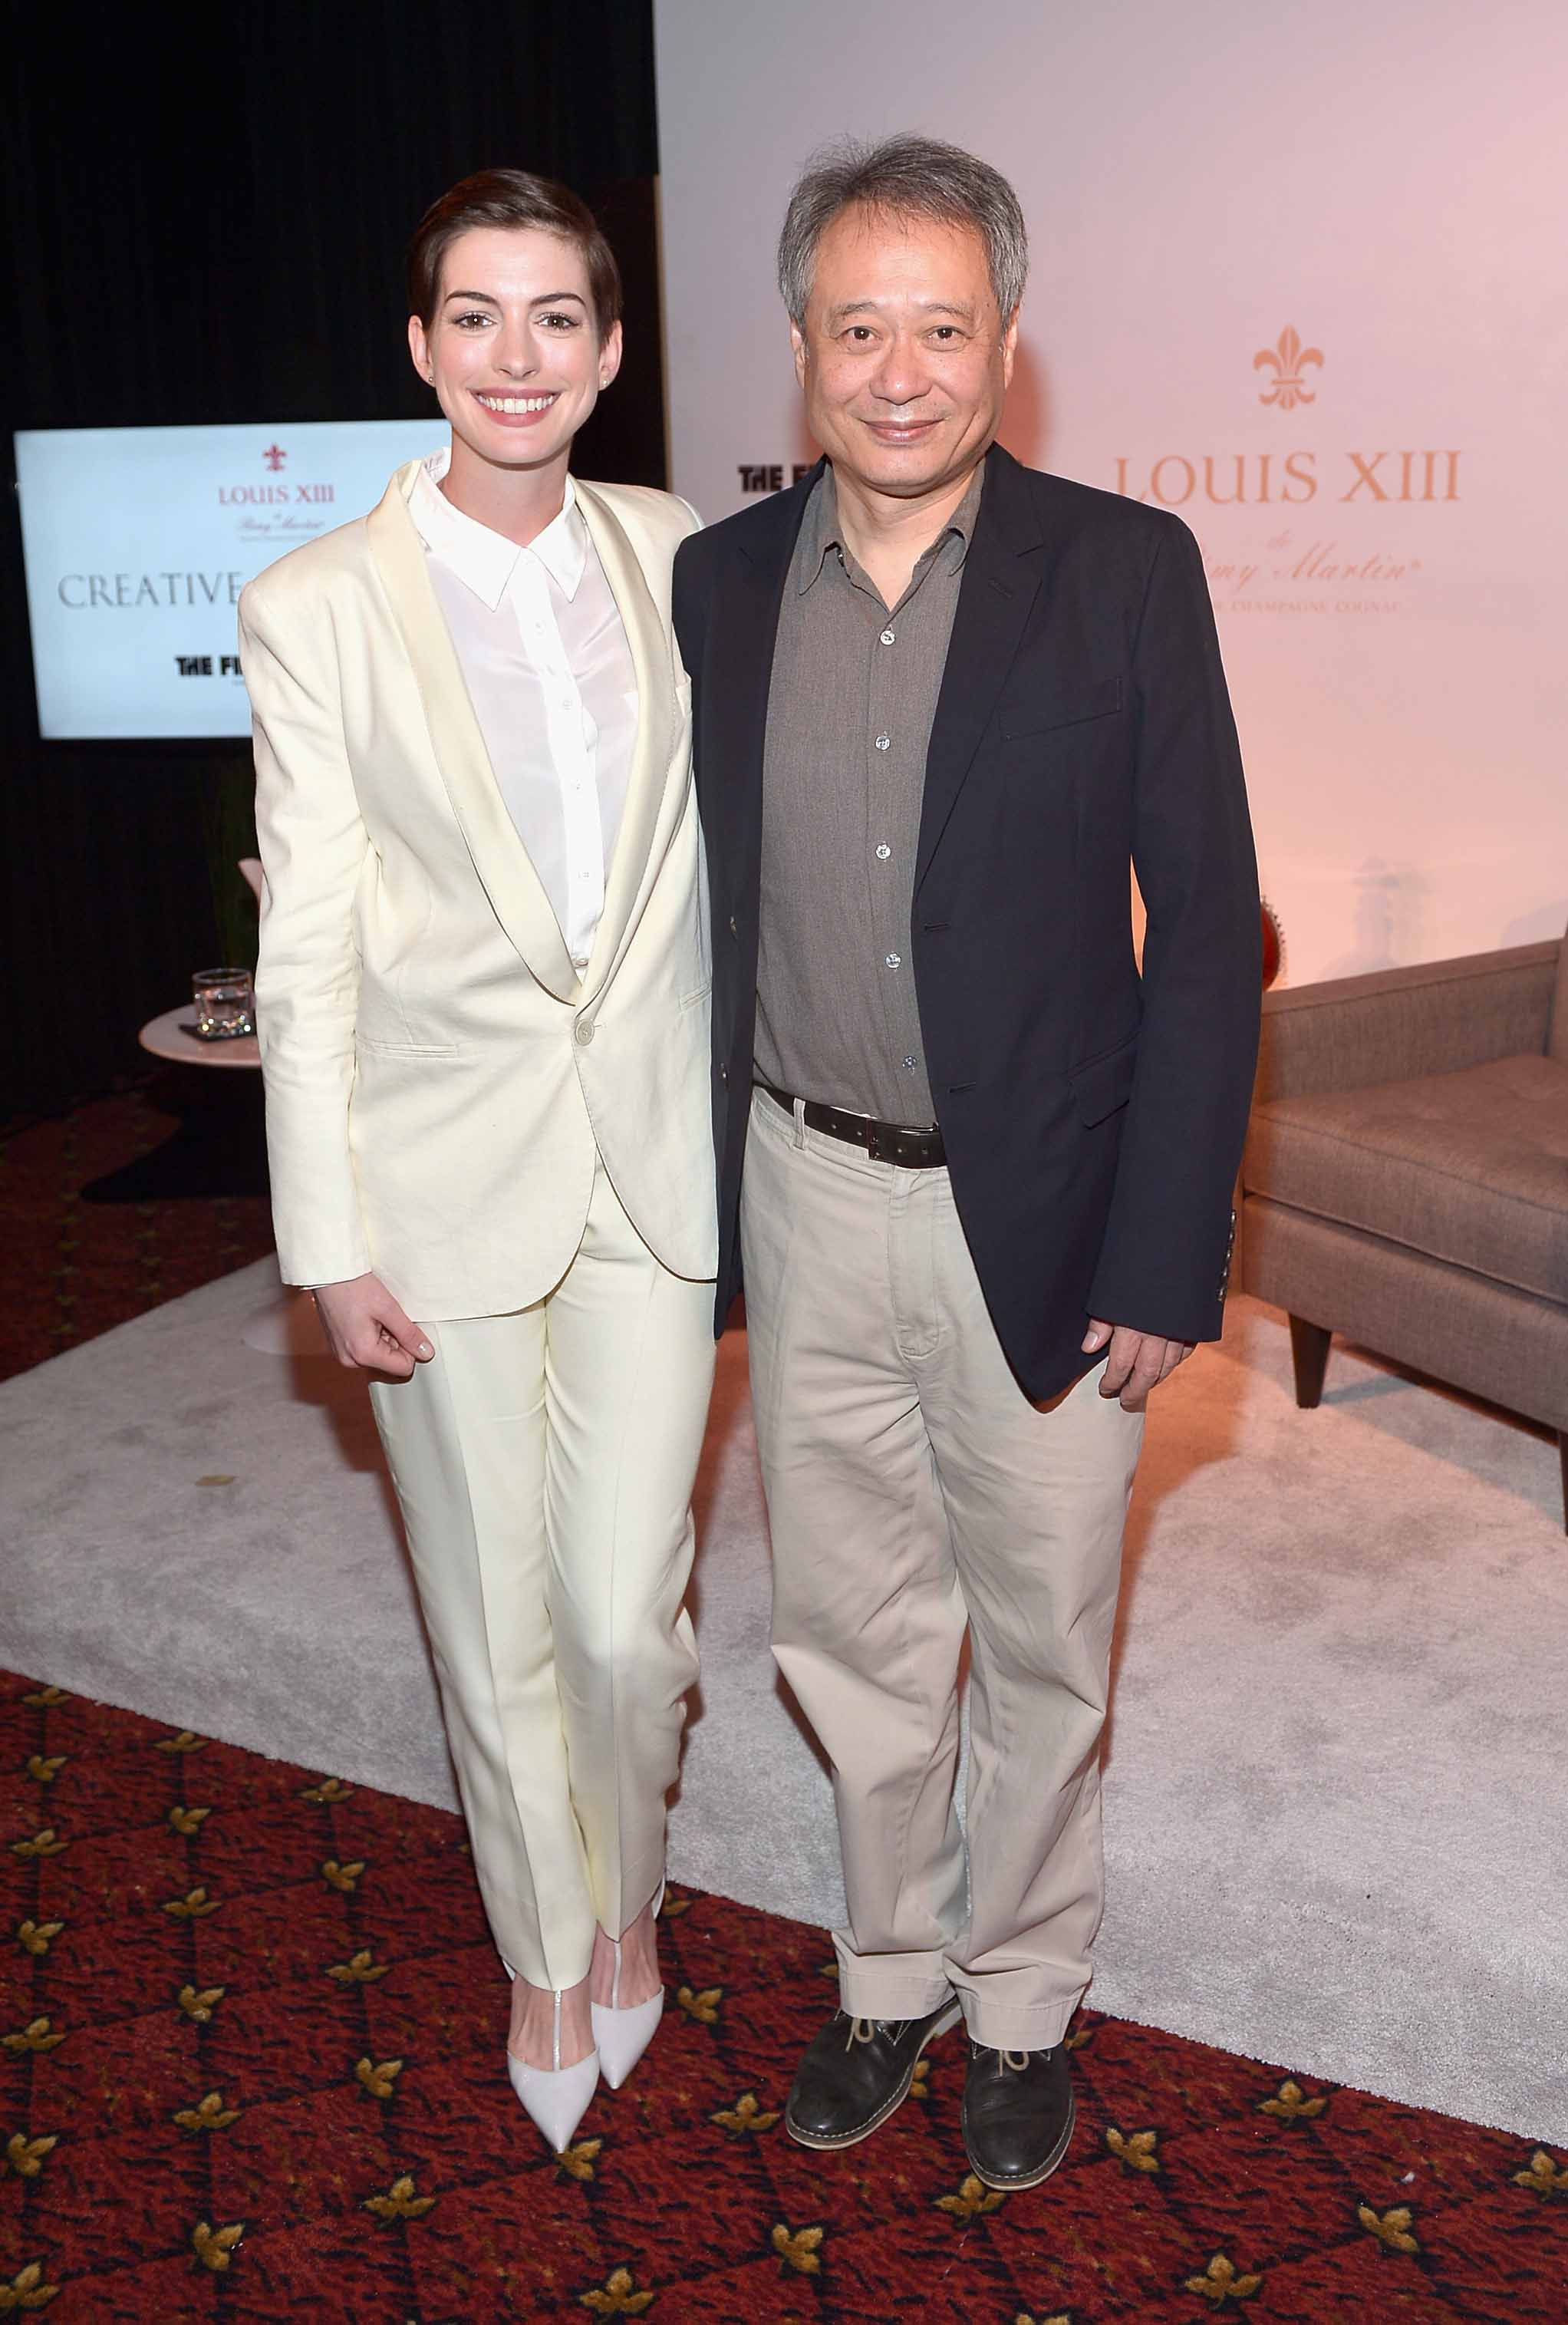 Anne Hathaway & Ang Lee